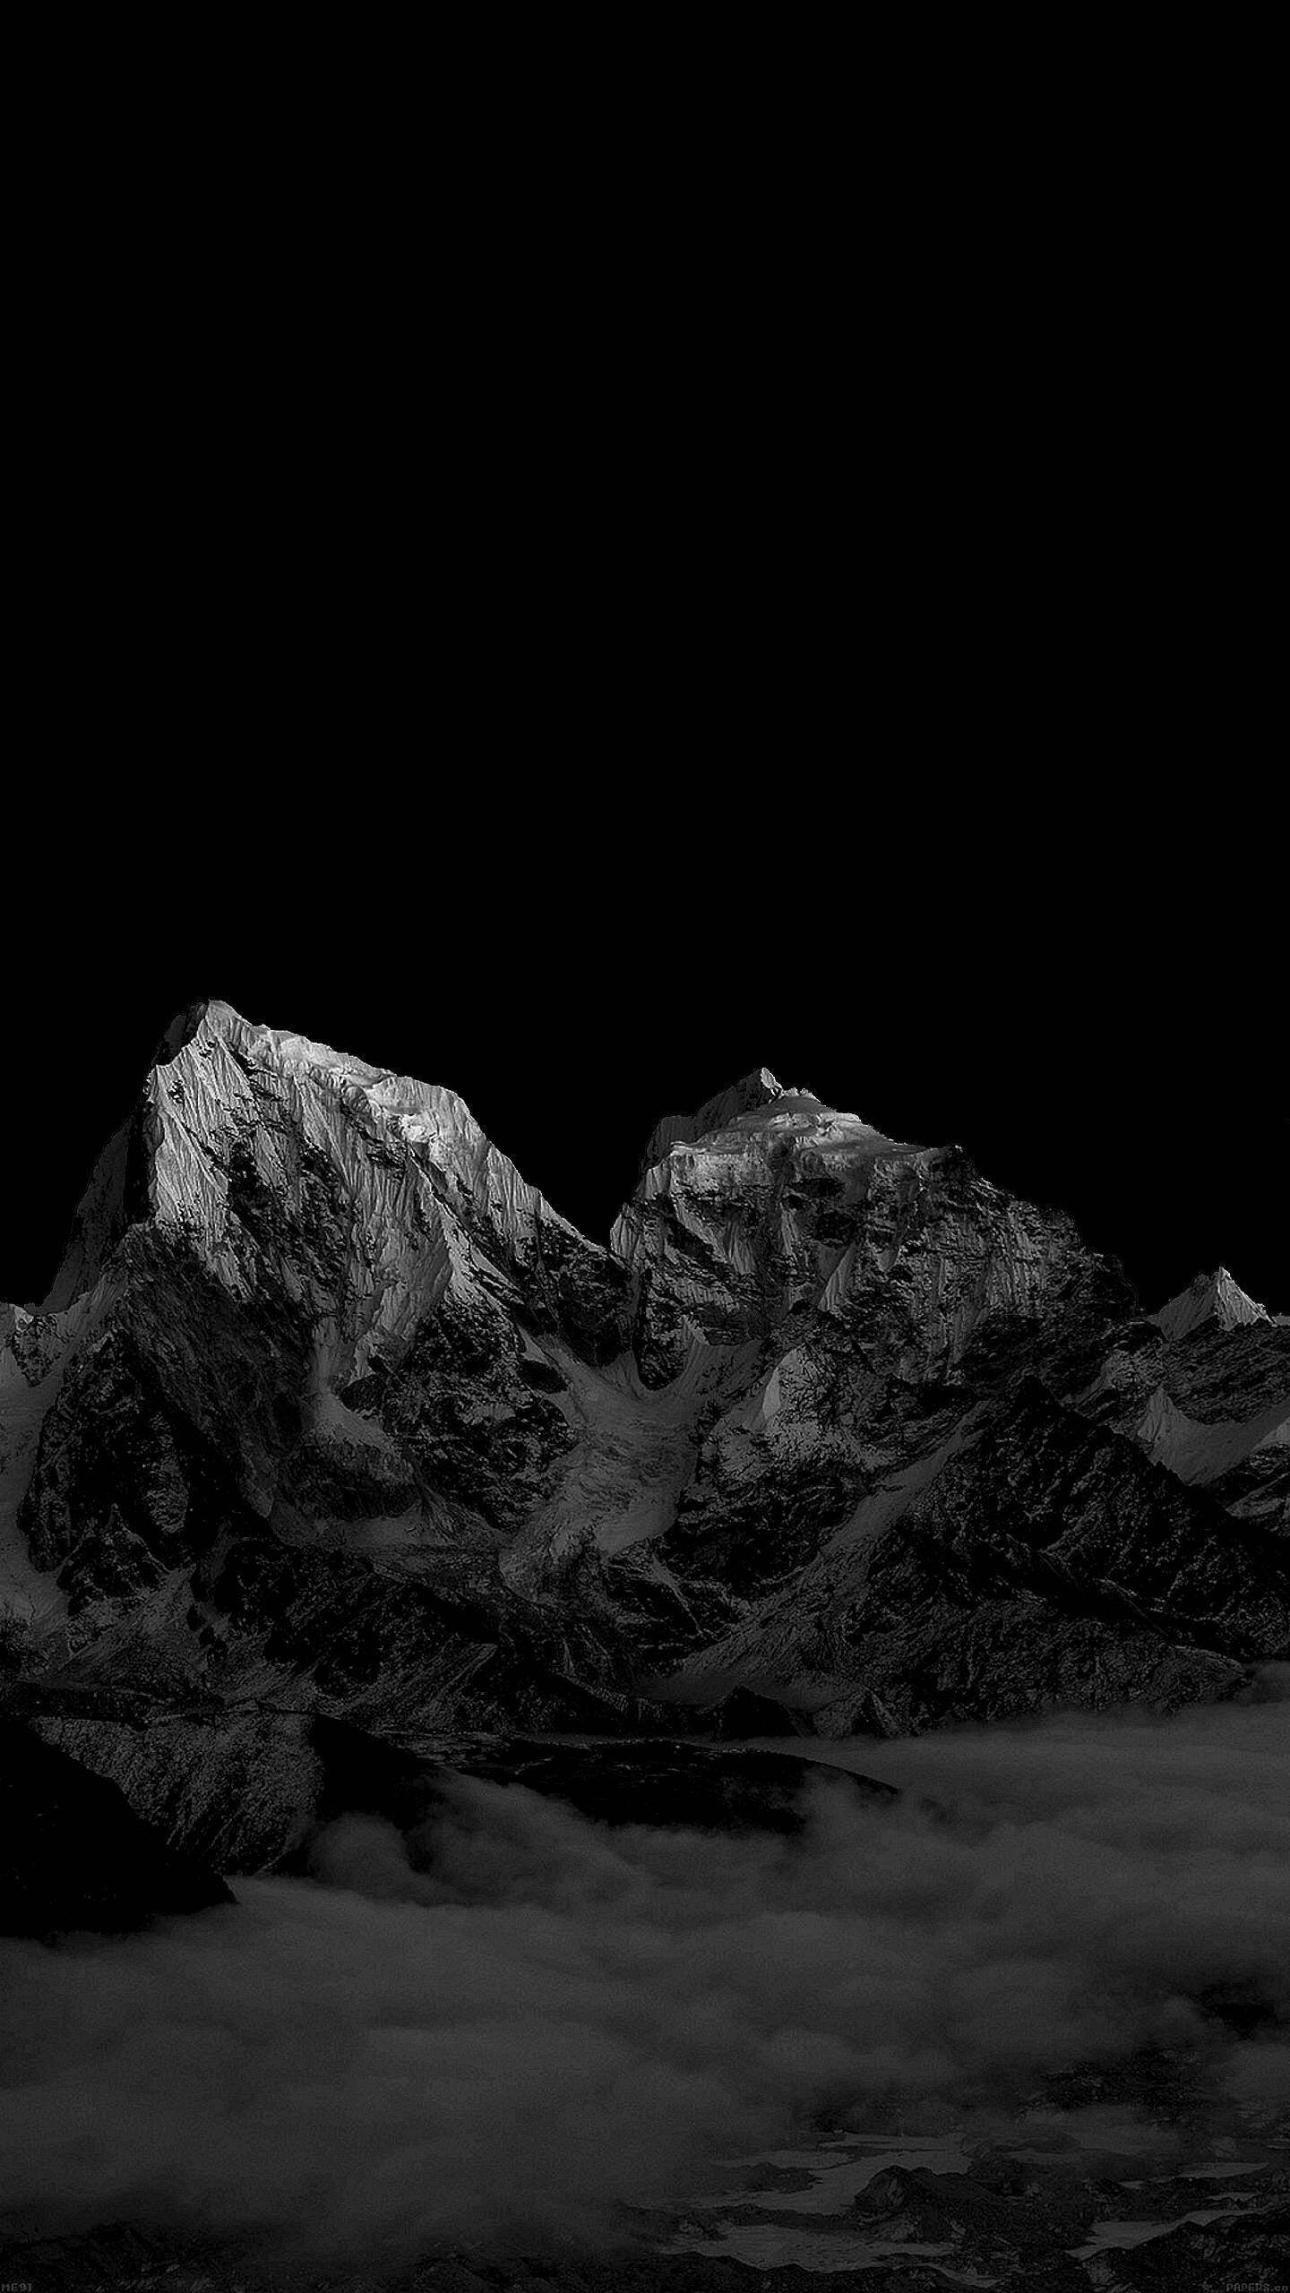 Mountains Black Wallpaper Iphone Dark Iphone Wallpaper Mountains Black Wallpaper Iphone